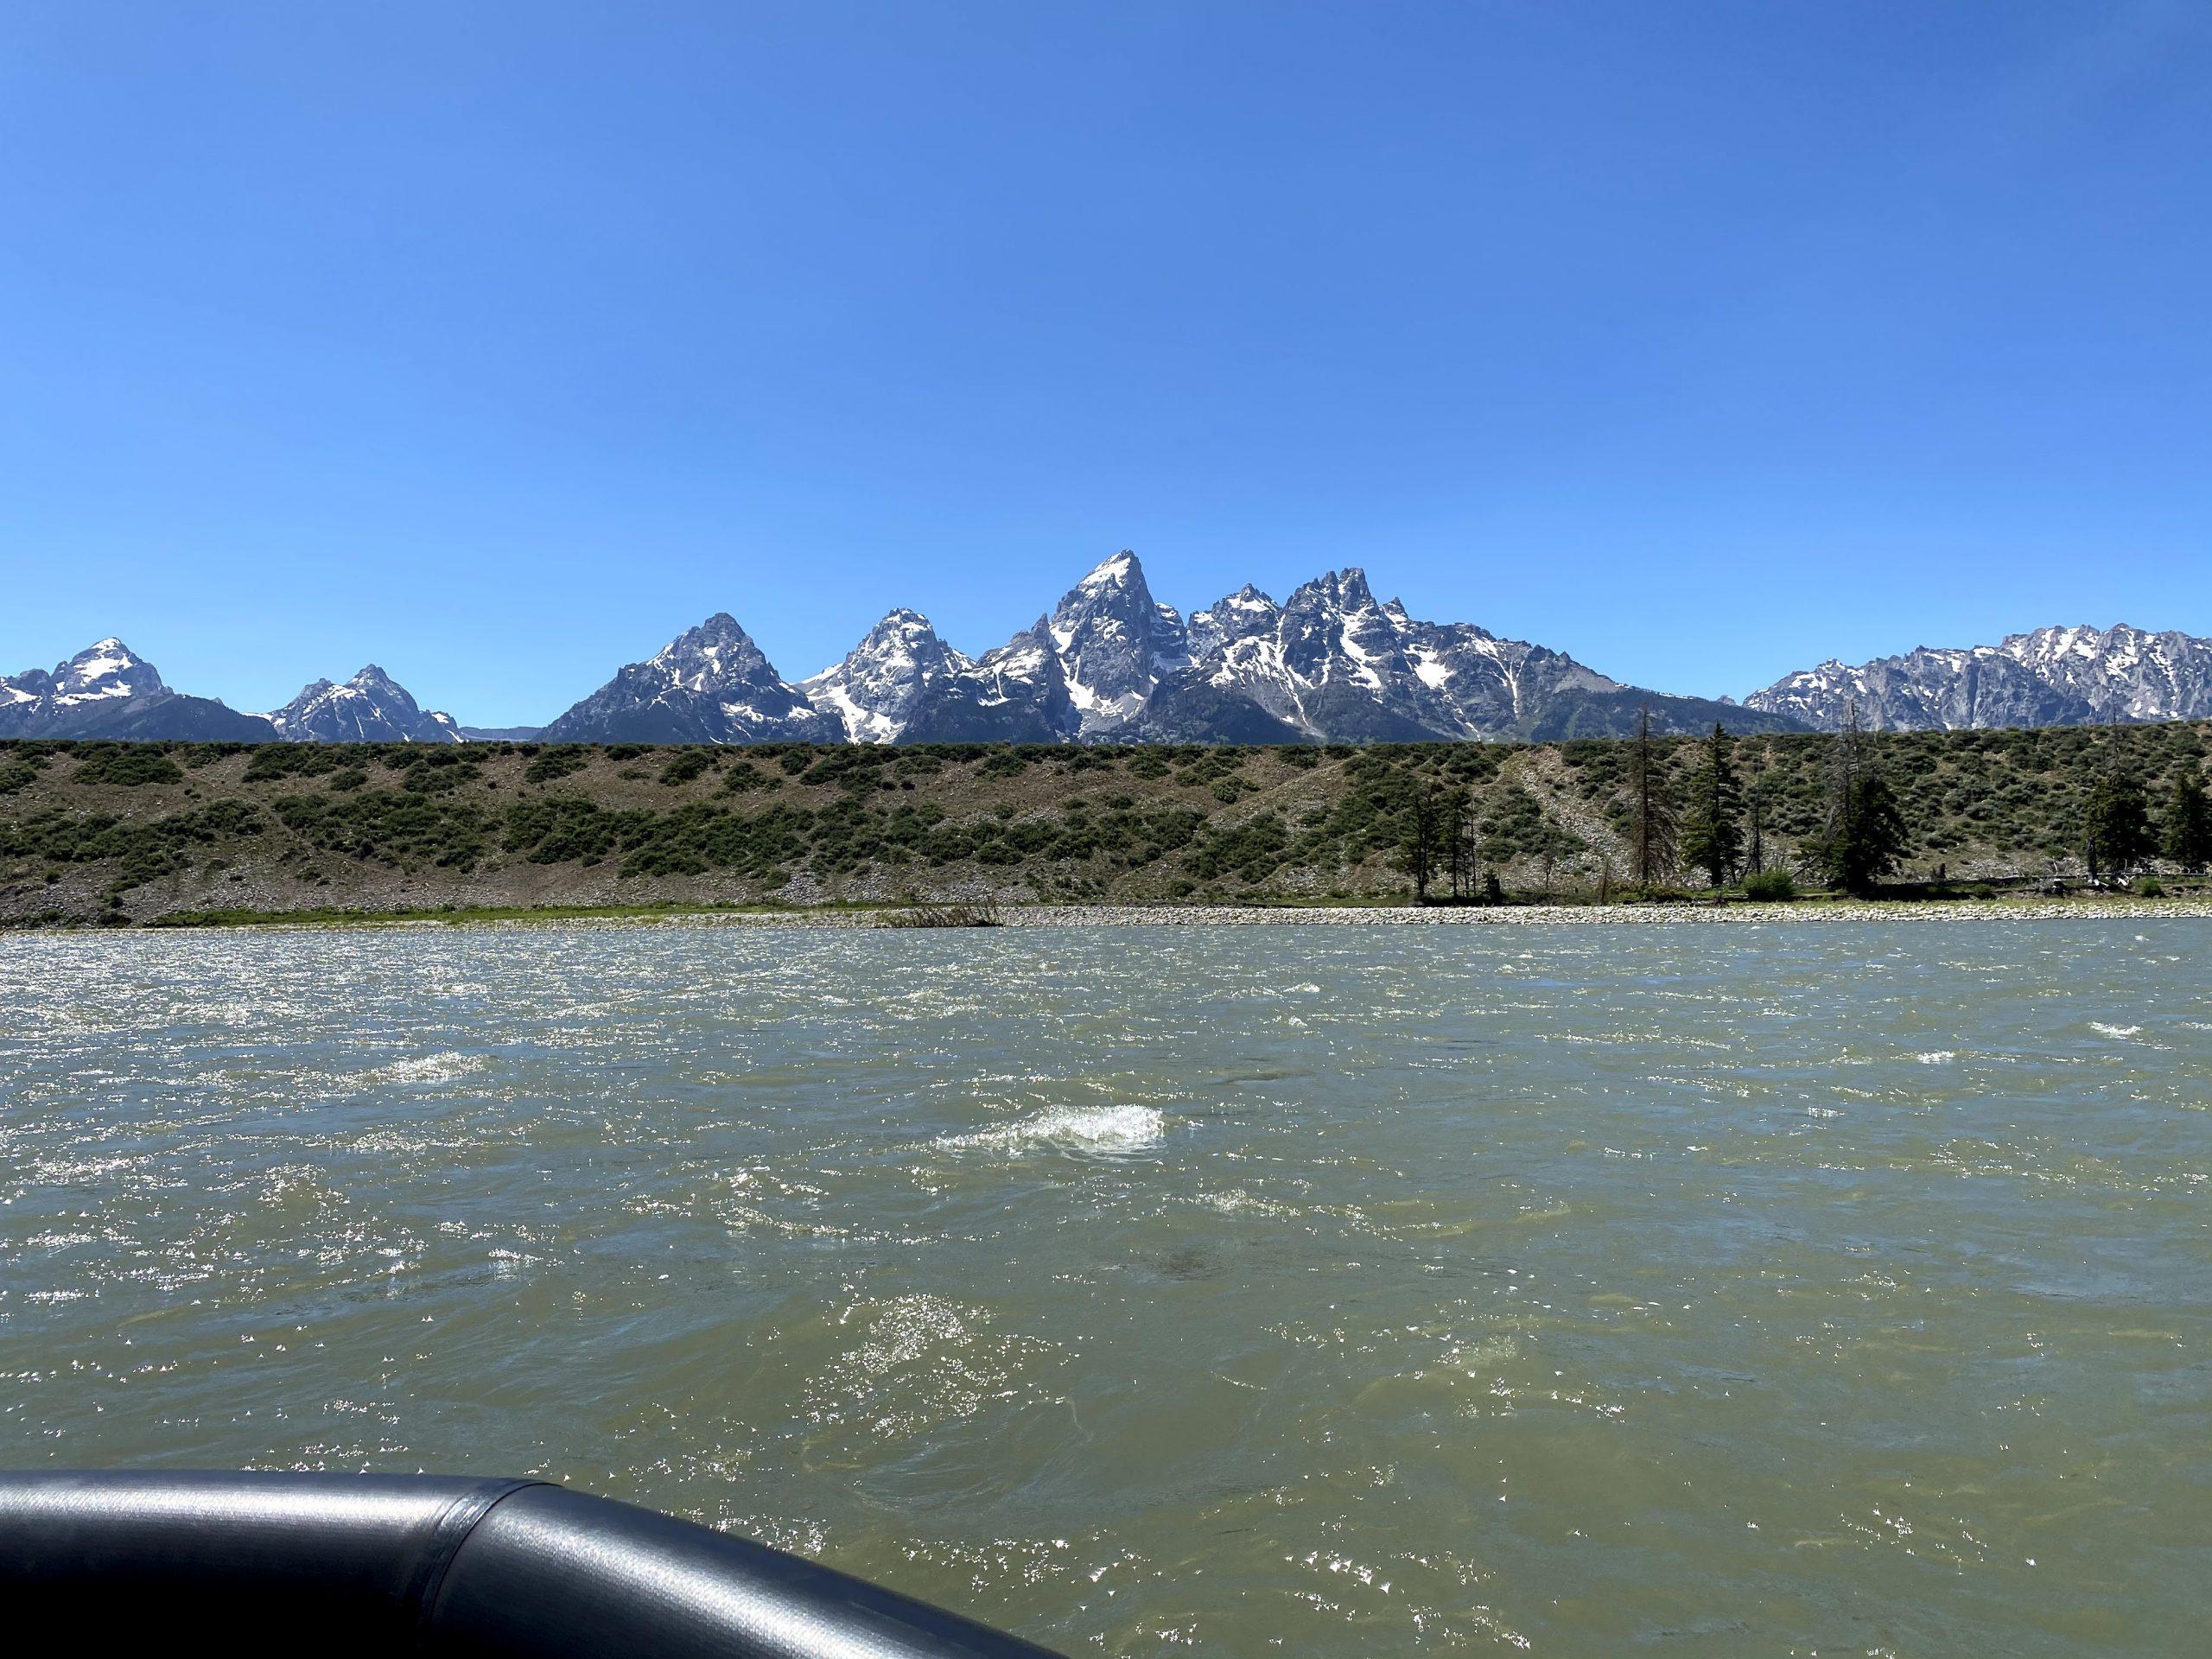 2021.06.16 Snake River Rafting